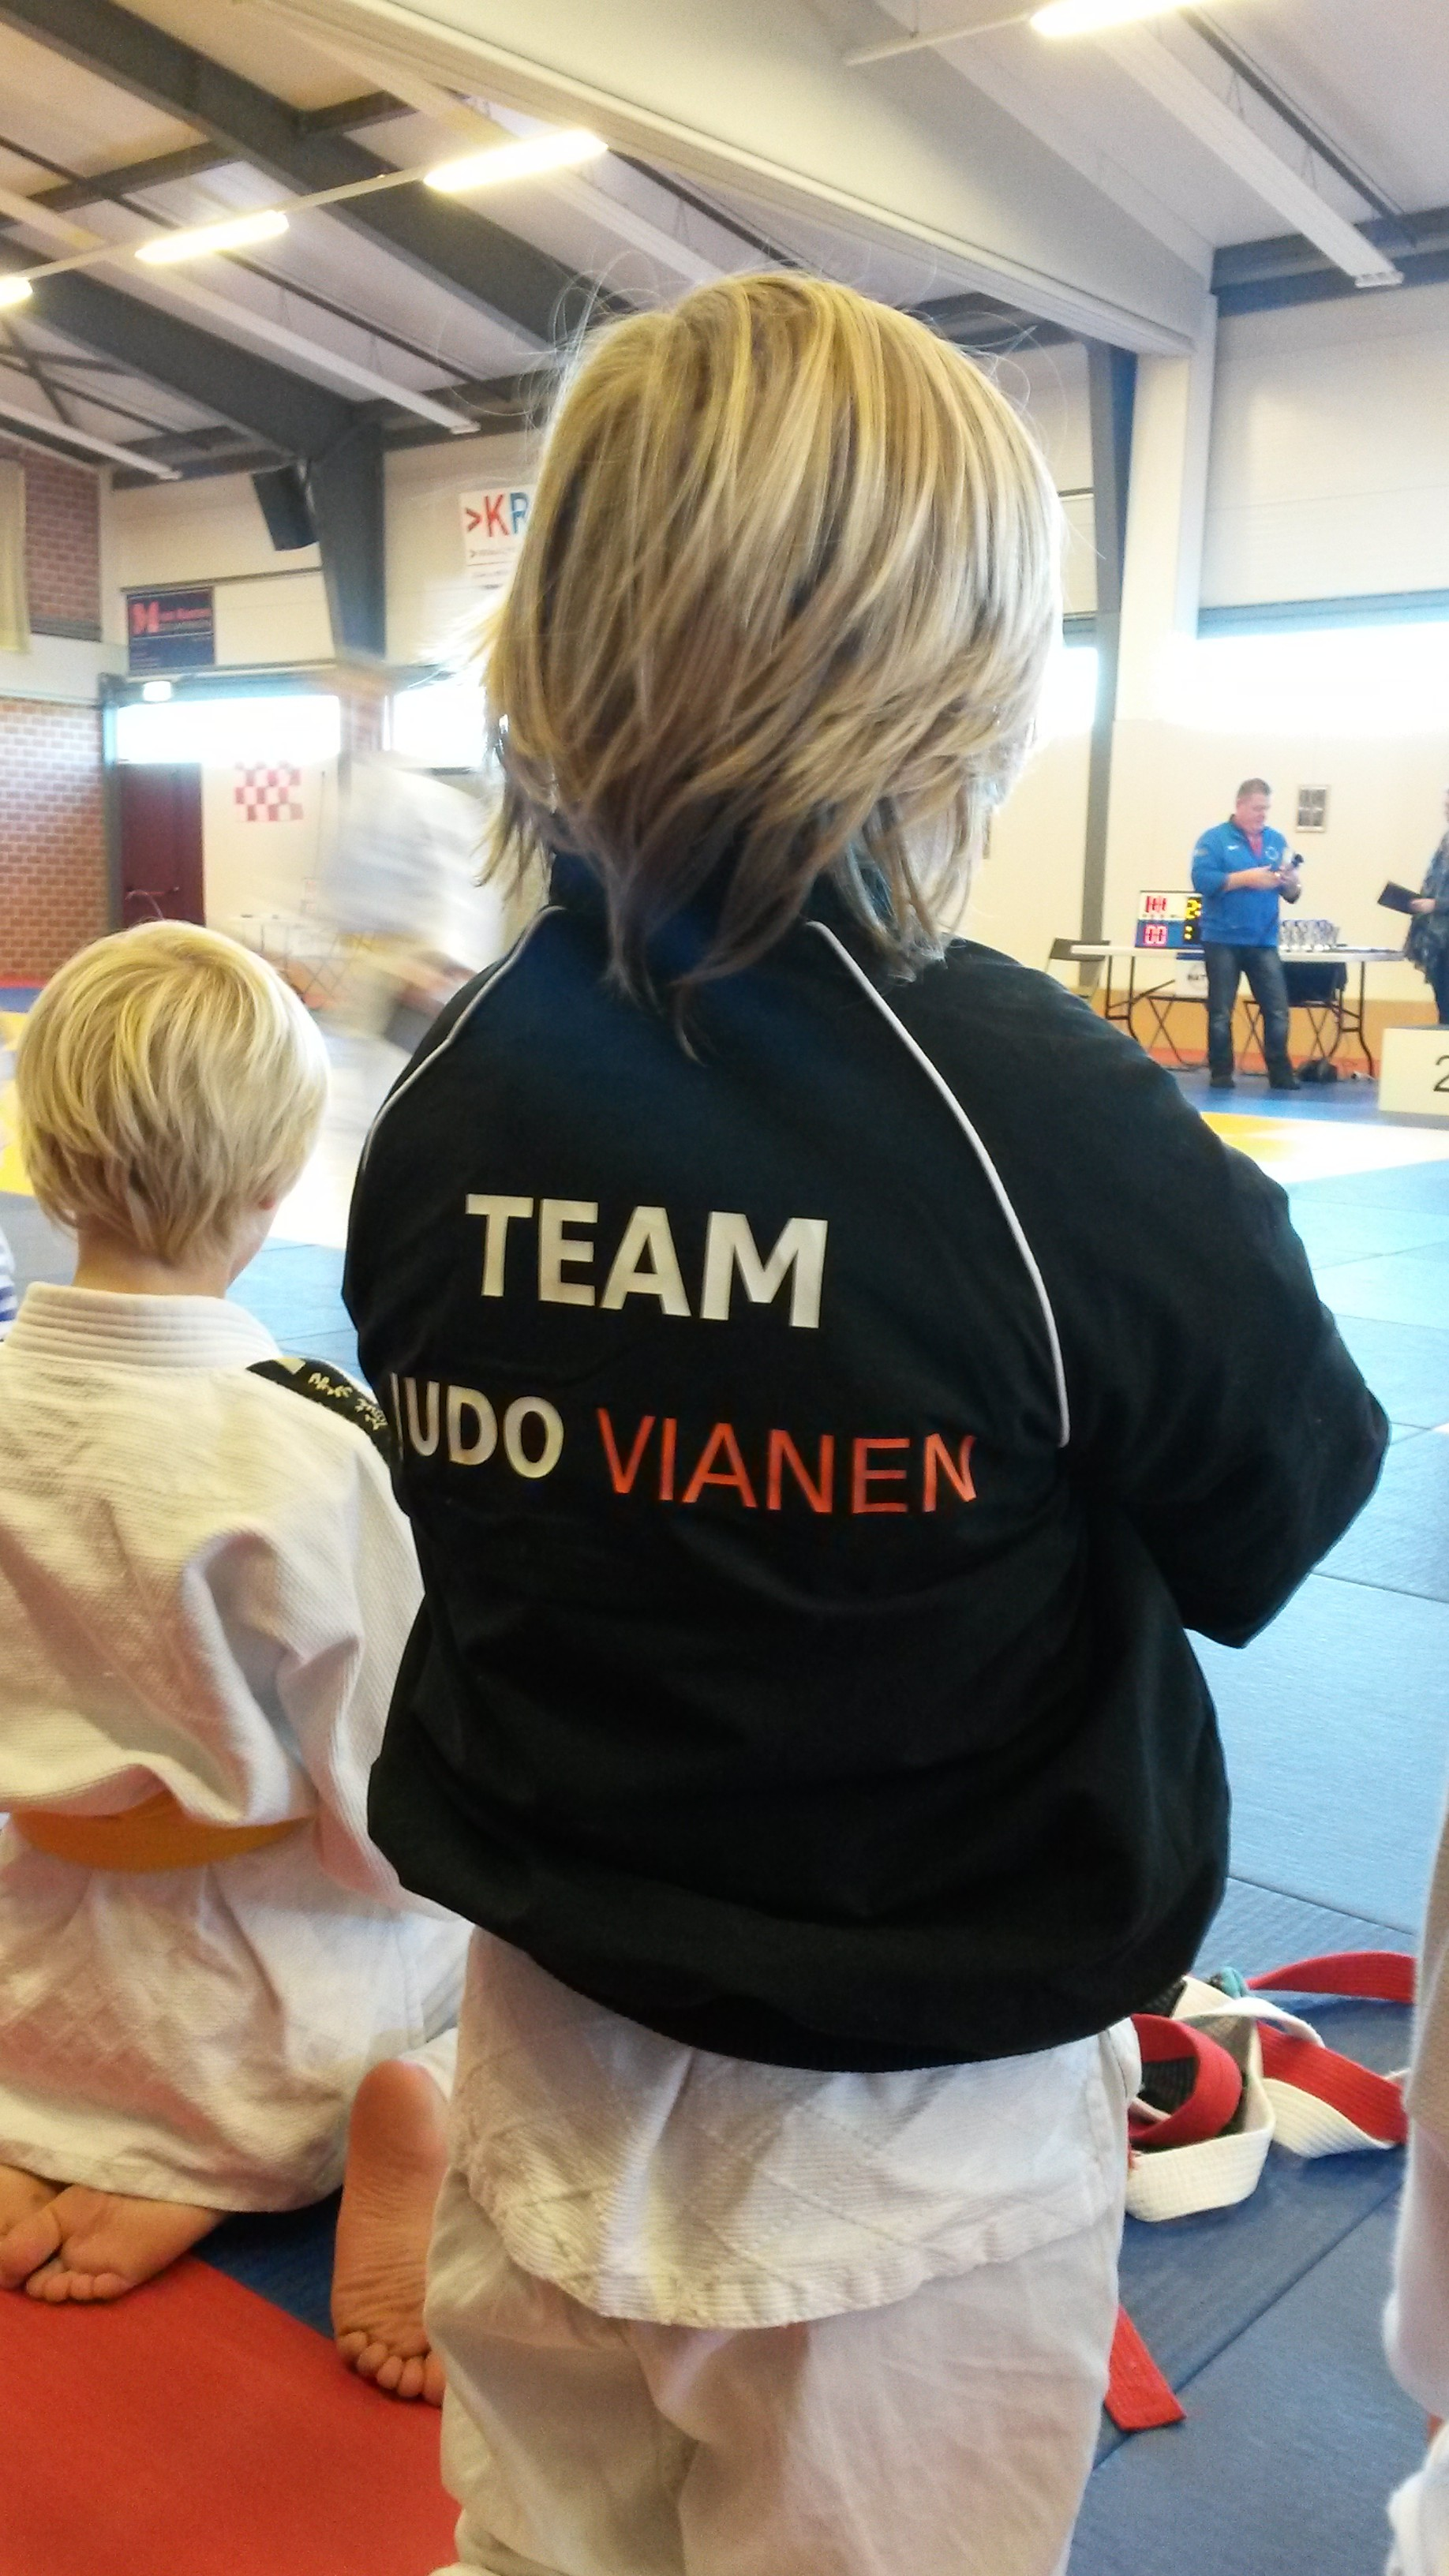 Sam Pijper wint goud bij Frans Odijk toernooi